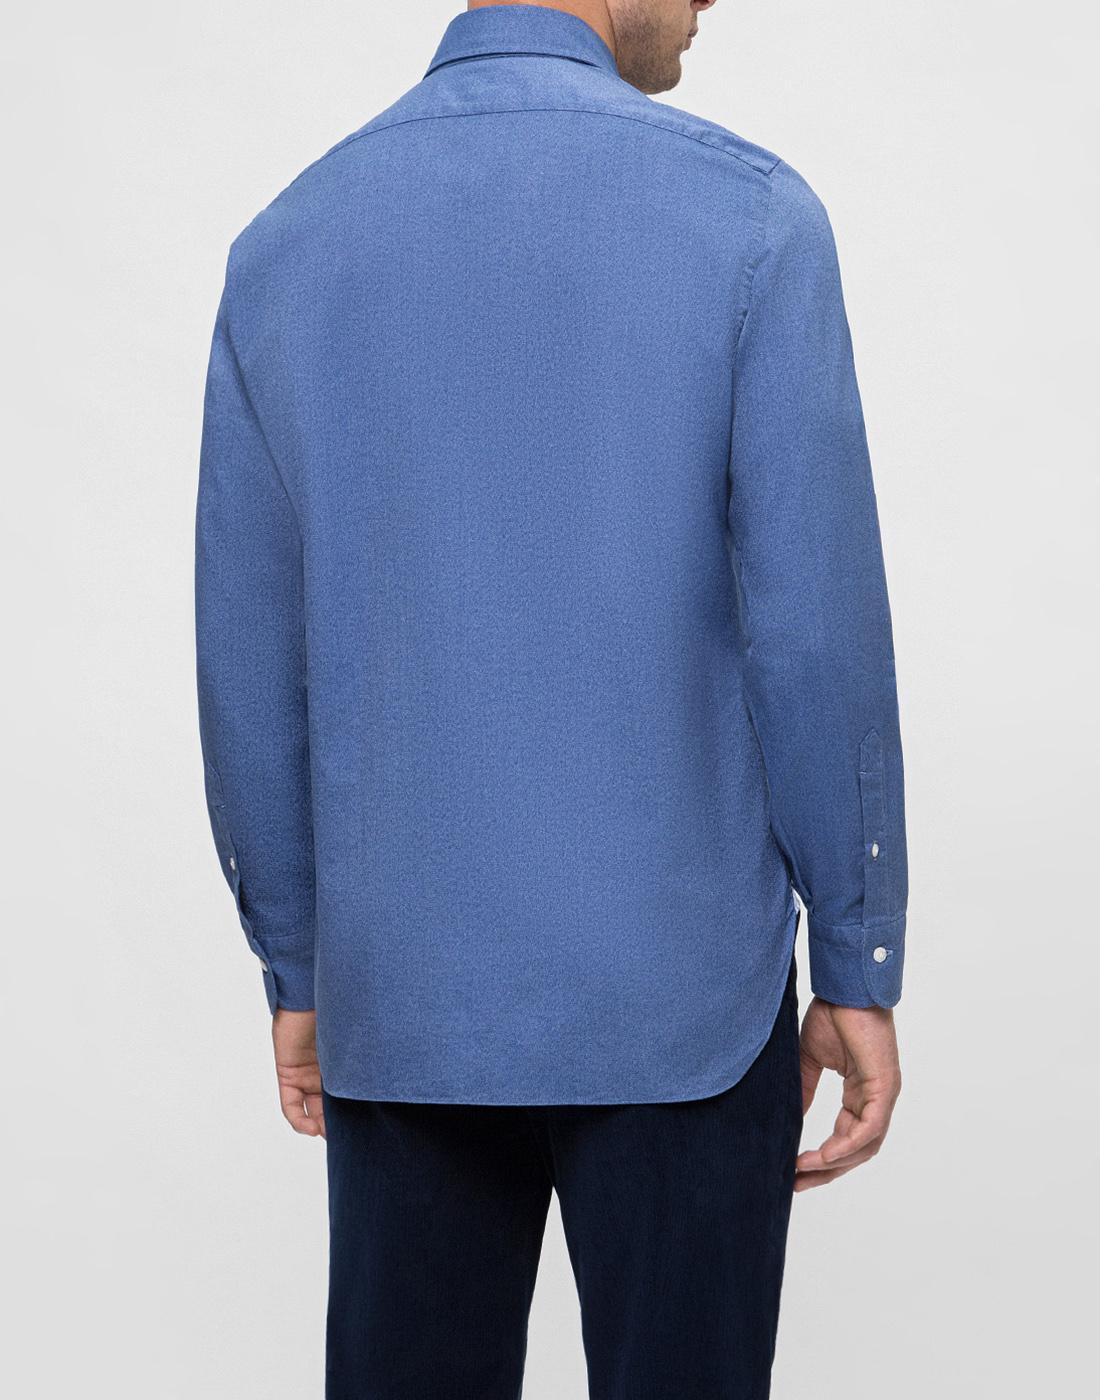 Мужская синяя рубашка Barba S554506U-4